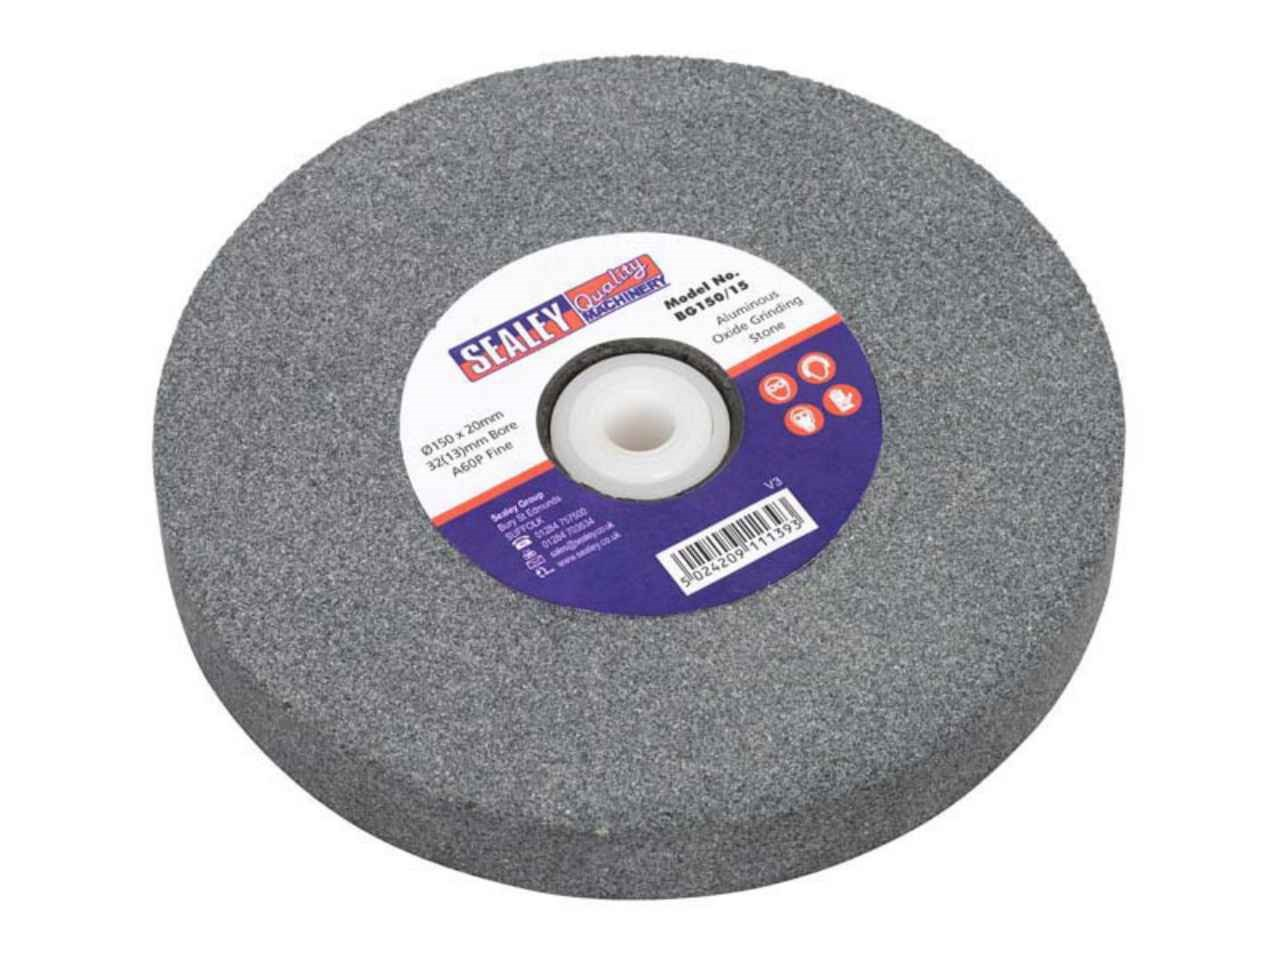 Sealey Bg150 15 150mm Grinding Stone For Bench Grinder